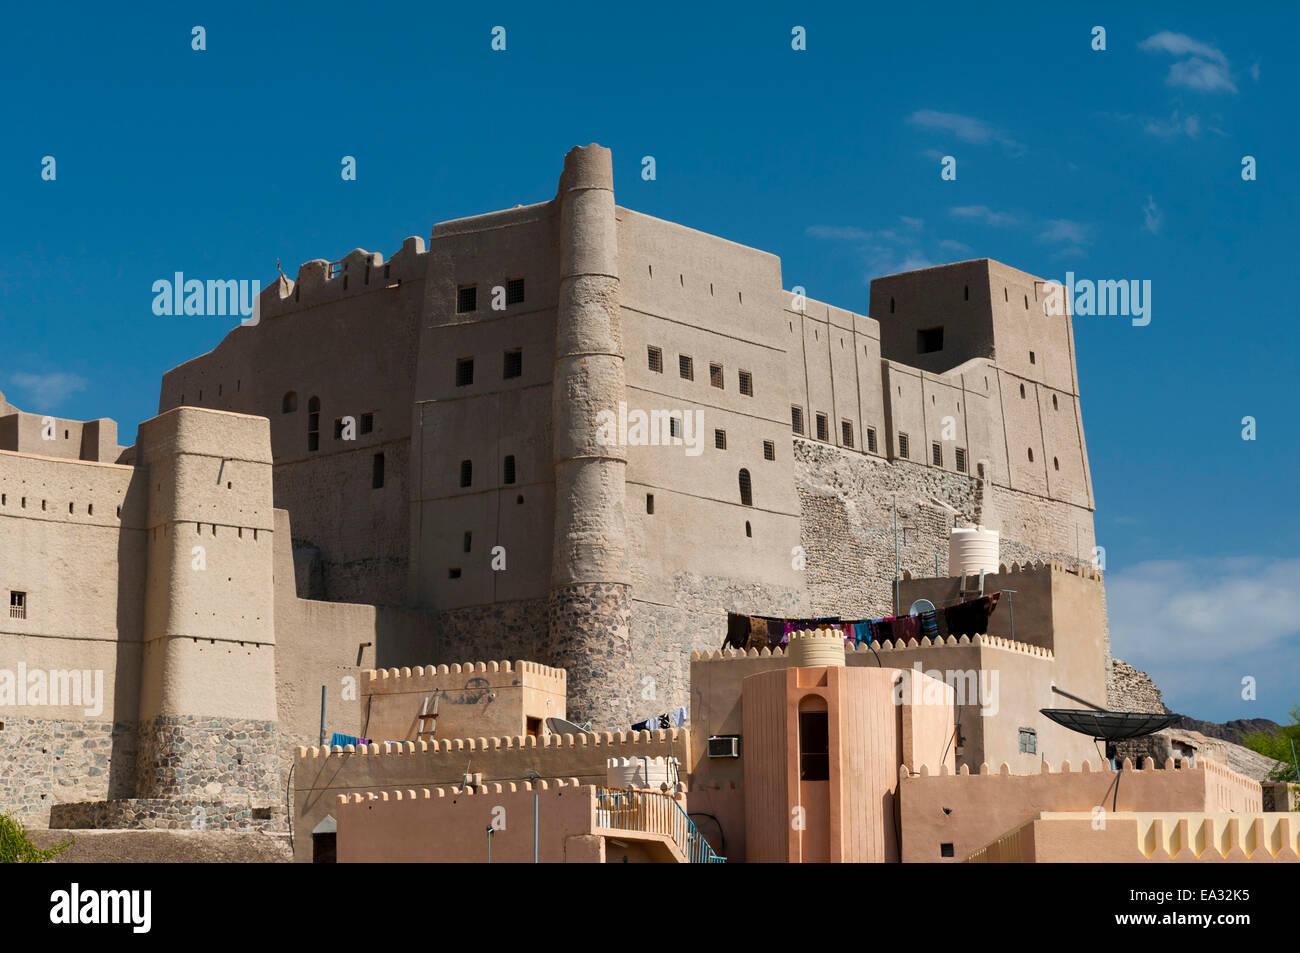 Fort de Bahla, UNESCO World Heritage Site, Oman, Middle East Photo Stock